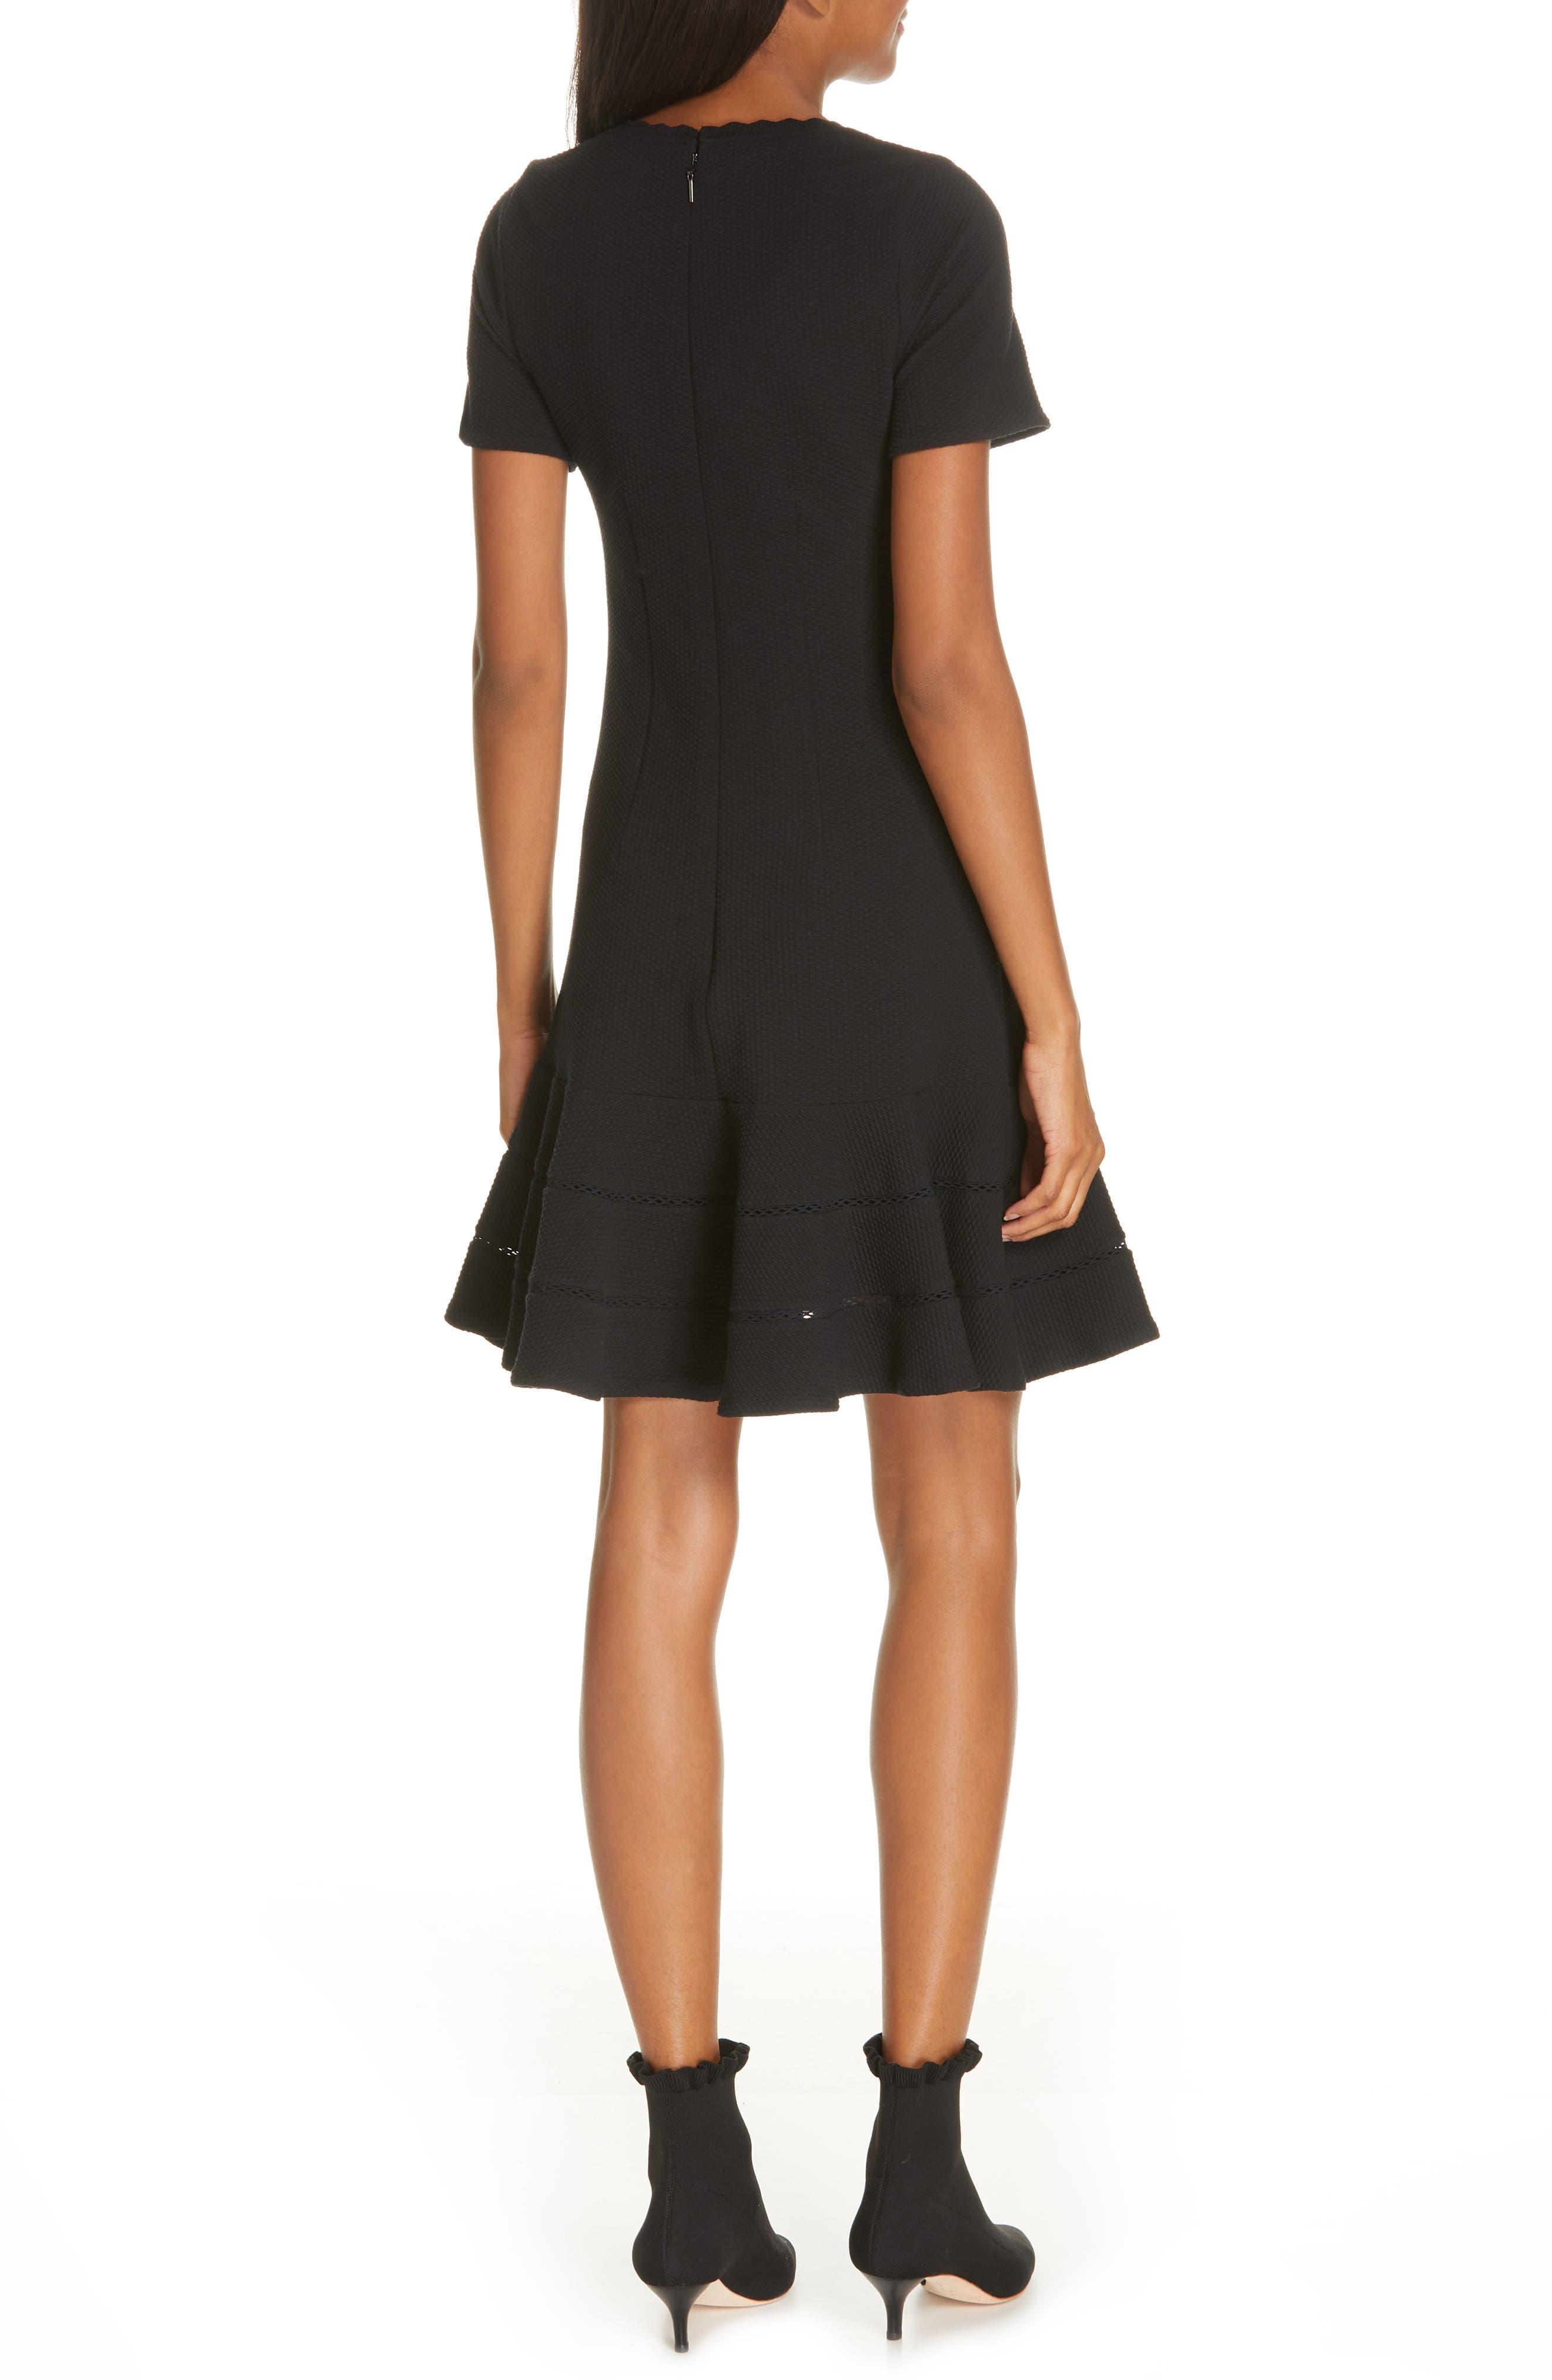 REBECCA TAYLOR, Fit & Flare Dress, Alternate thumbnail 2, color, BLACK